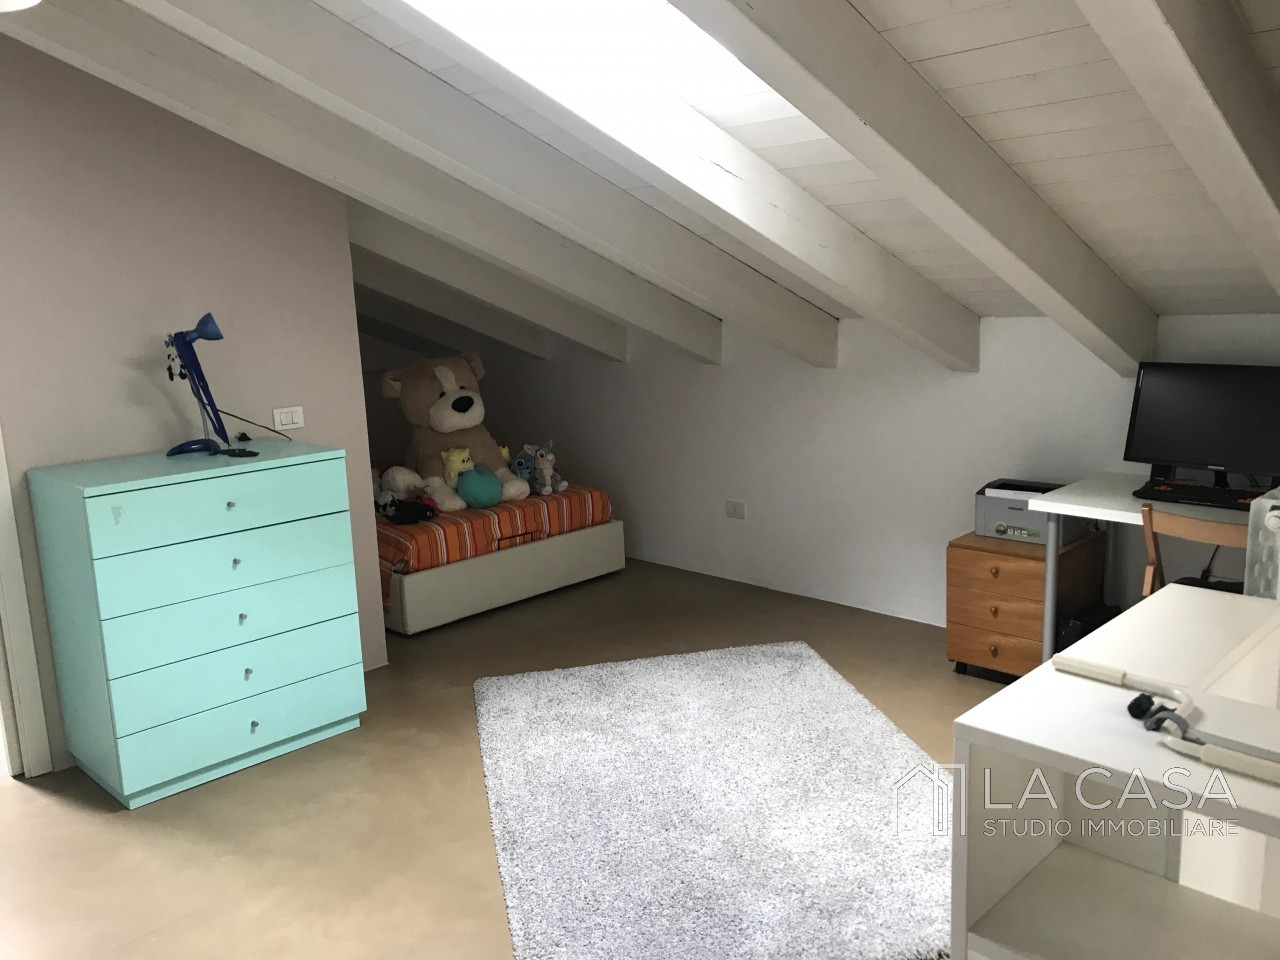 Loft in vendita a Borgomeduna di Pordenone - L1 https://media.gestionaleimmobiliare.it/foto/annunci/191202/2118232/1280x1280/007__img_1612_wmk_0.jpg